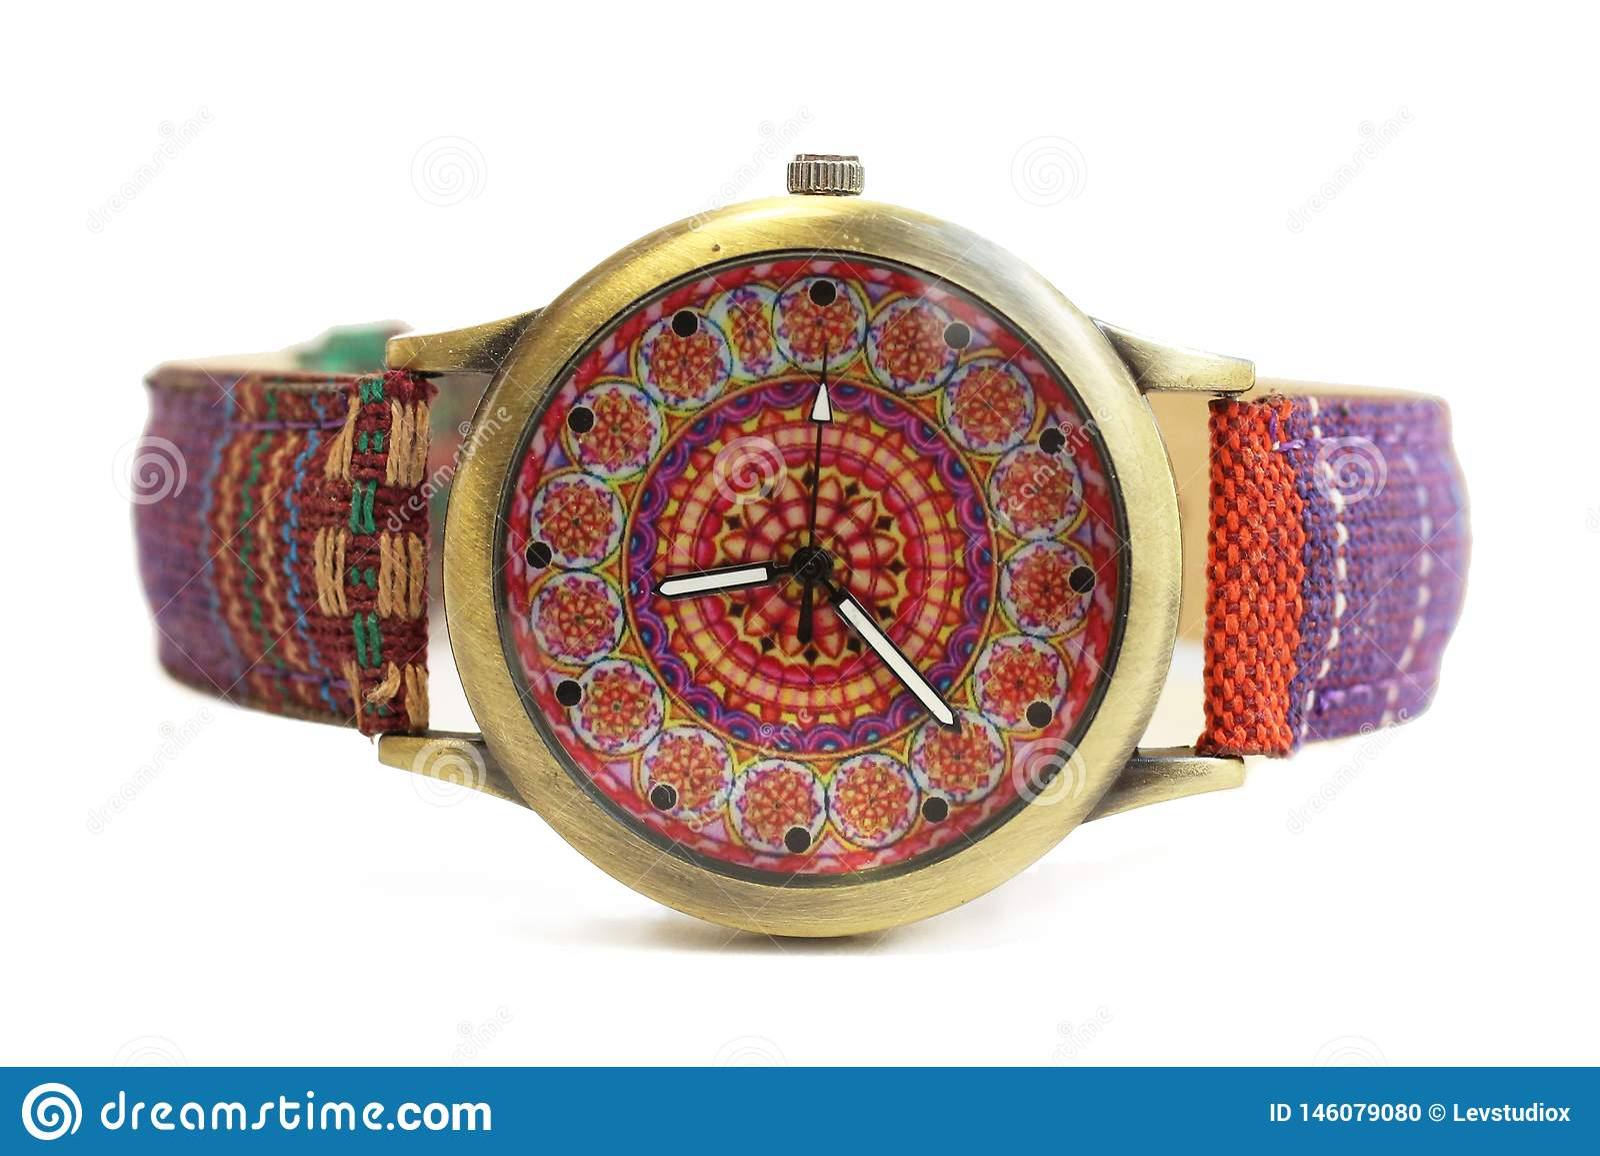 Wristwatches στο εθνικό ύφος χίπηδων σε ένα απομονωμένο λευκό υπόβαθρο